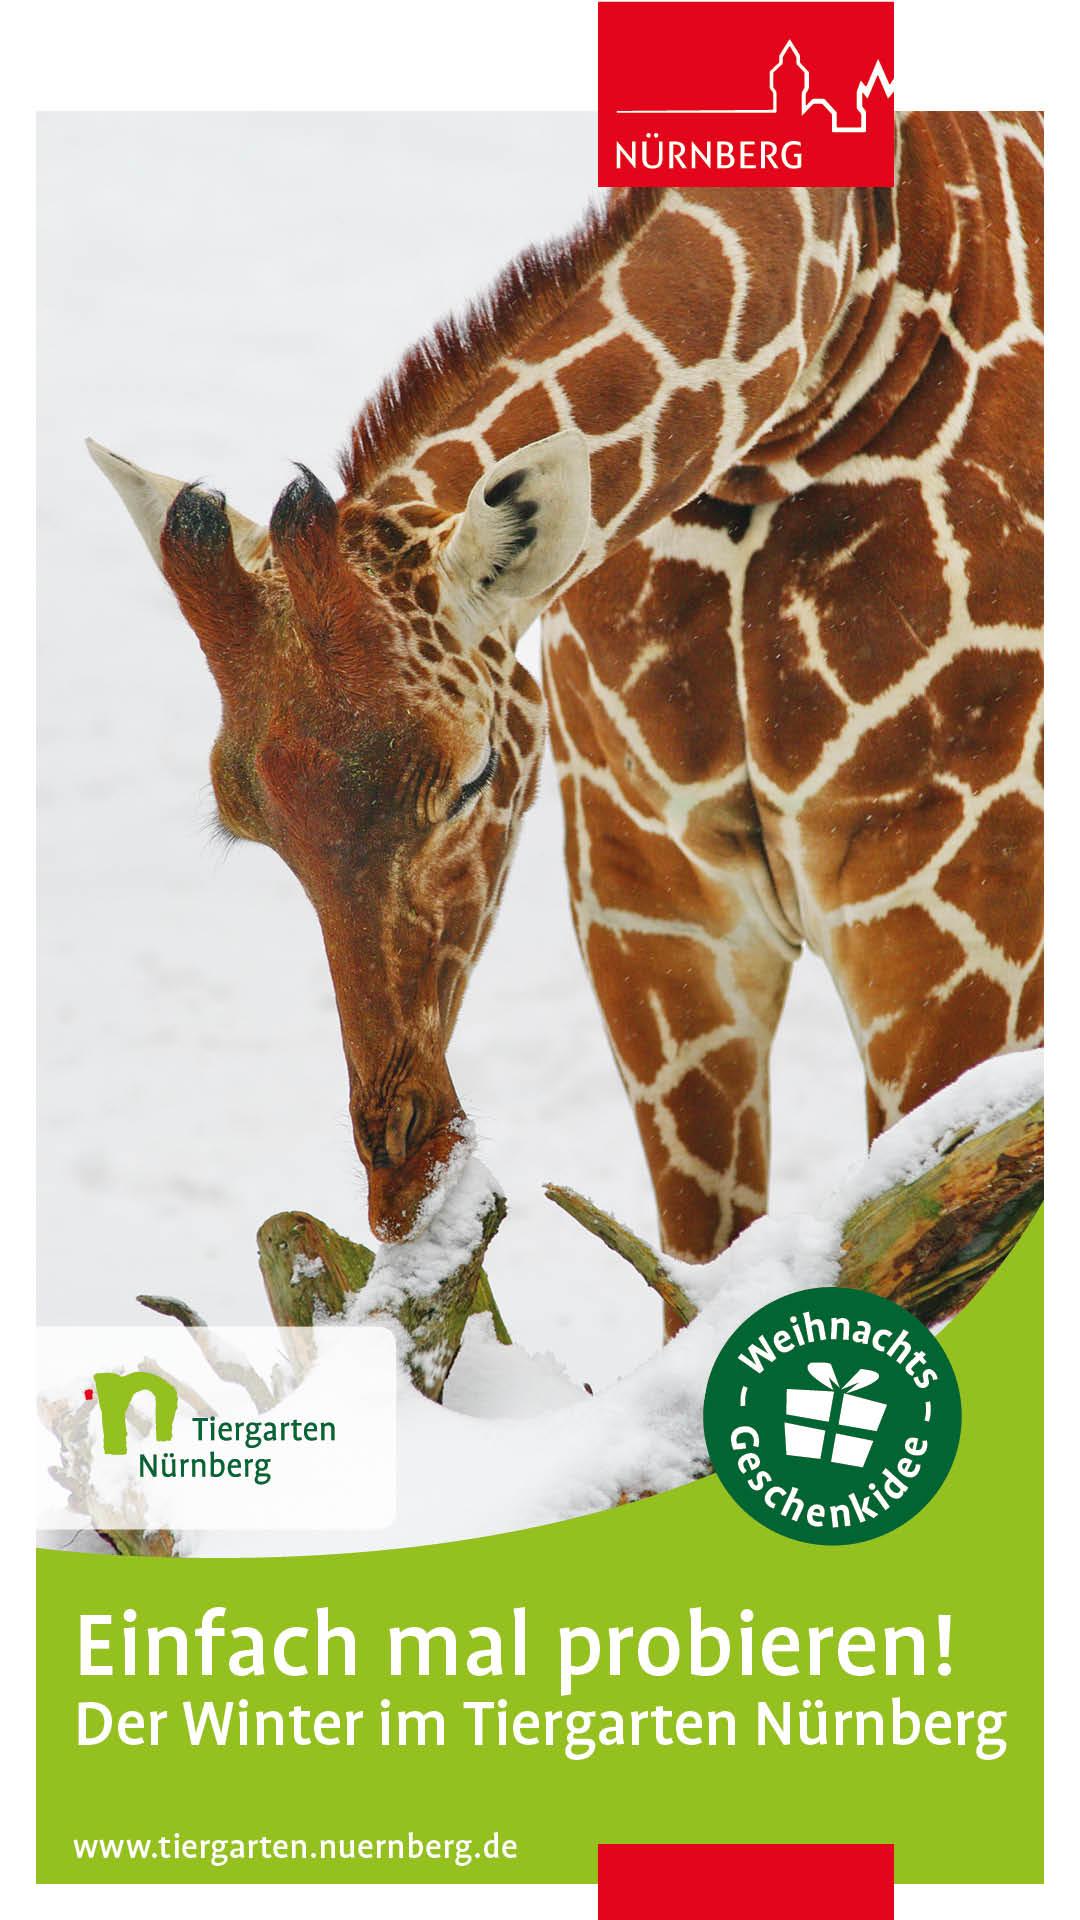 Tiergarten Nürnberg Jahreskarte